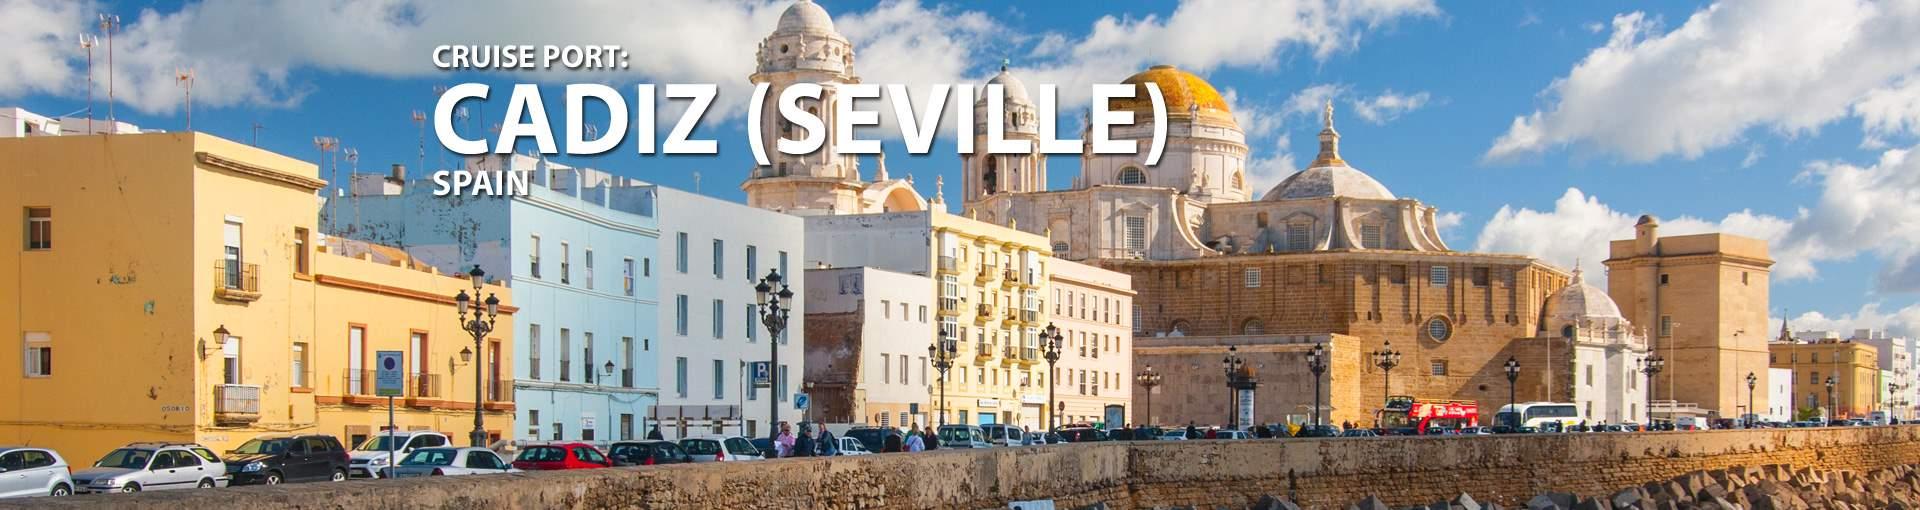 Cruises to Cadiz (Seville), Spain